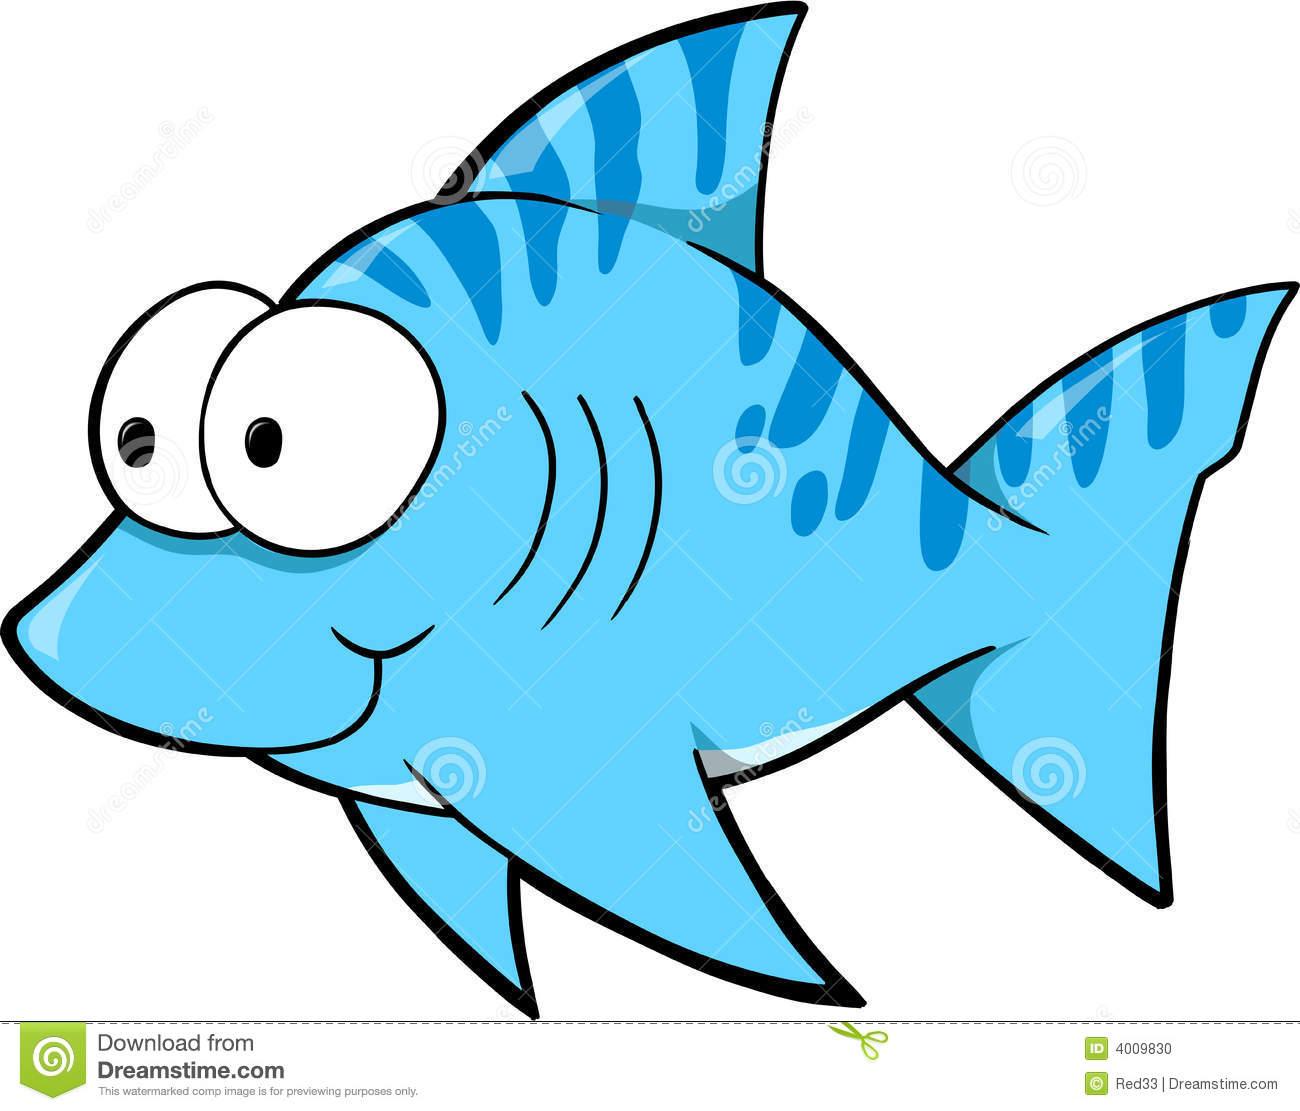 1300x1111 Excellent Clip Art Fish Png Images Transparent Pictures Only